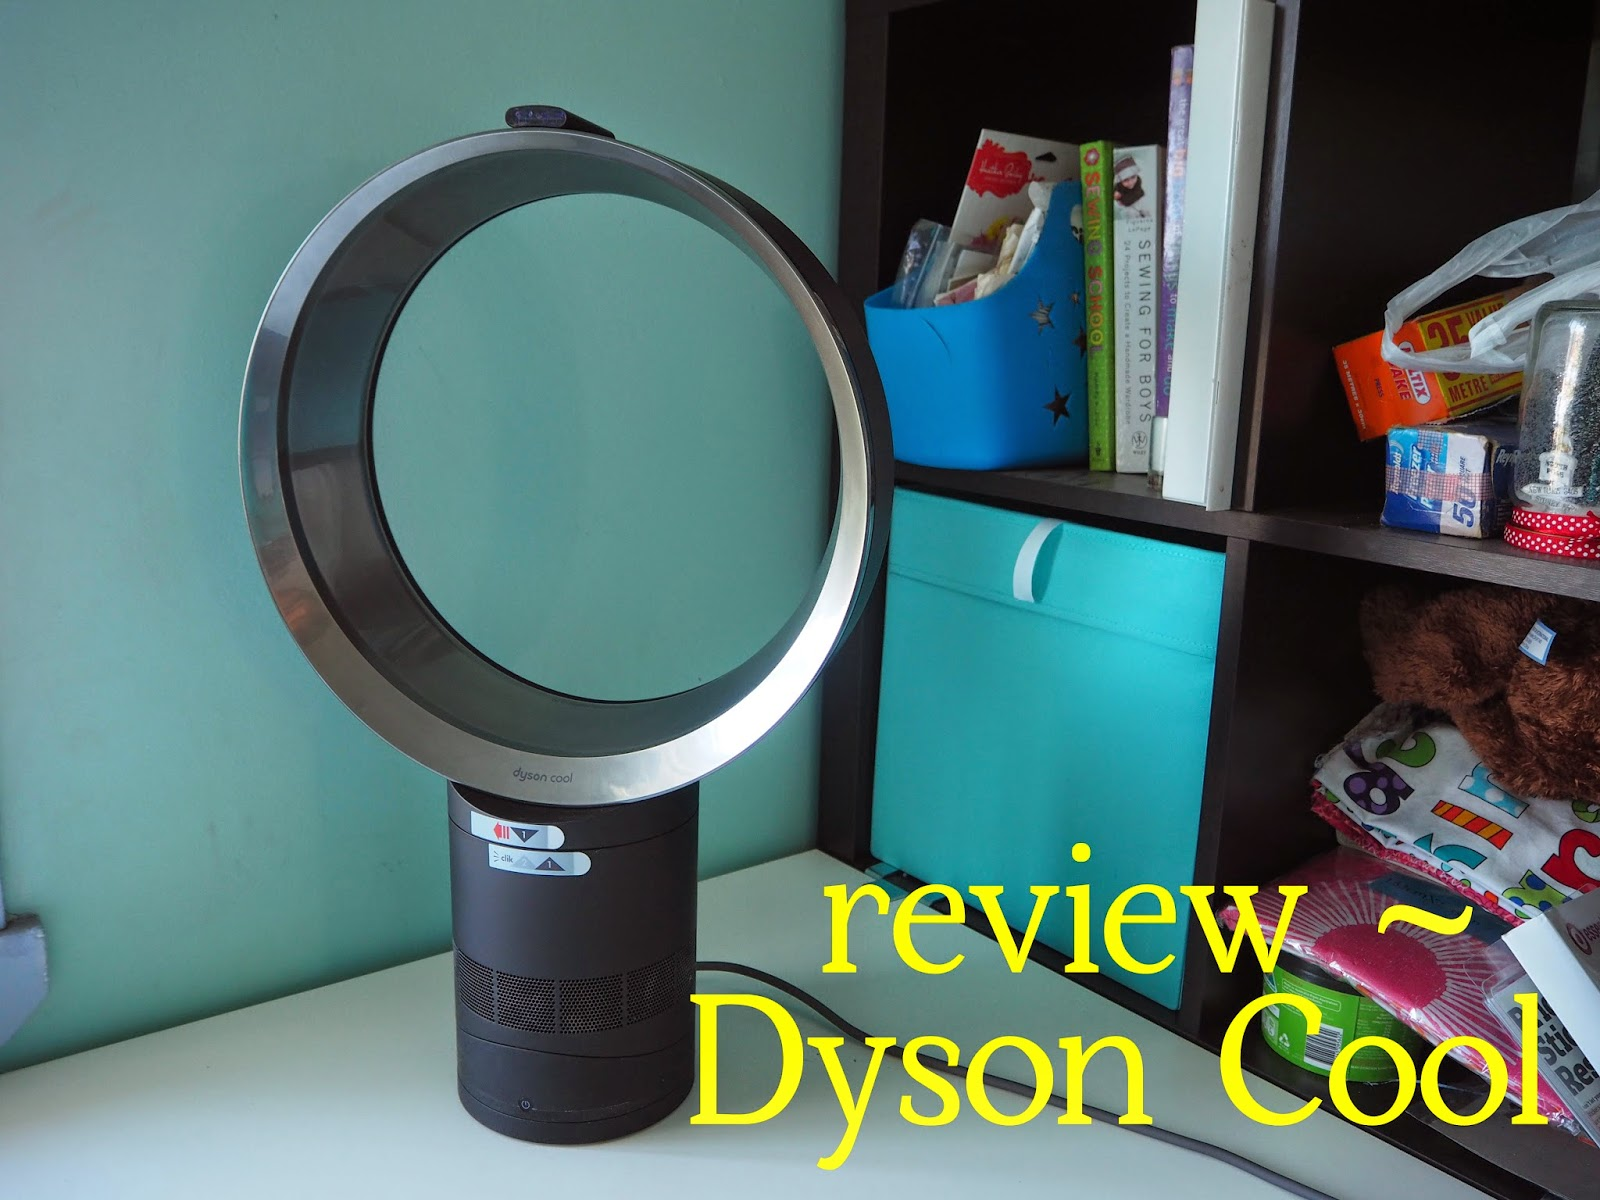 review dyson cool am06 desk fan life behind the purple door. Black Bedroom Furniture Sets. Home Design Ideas